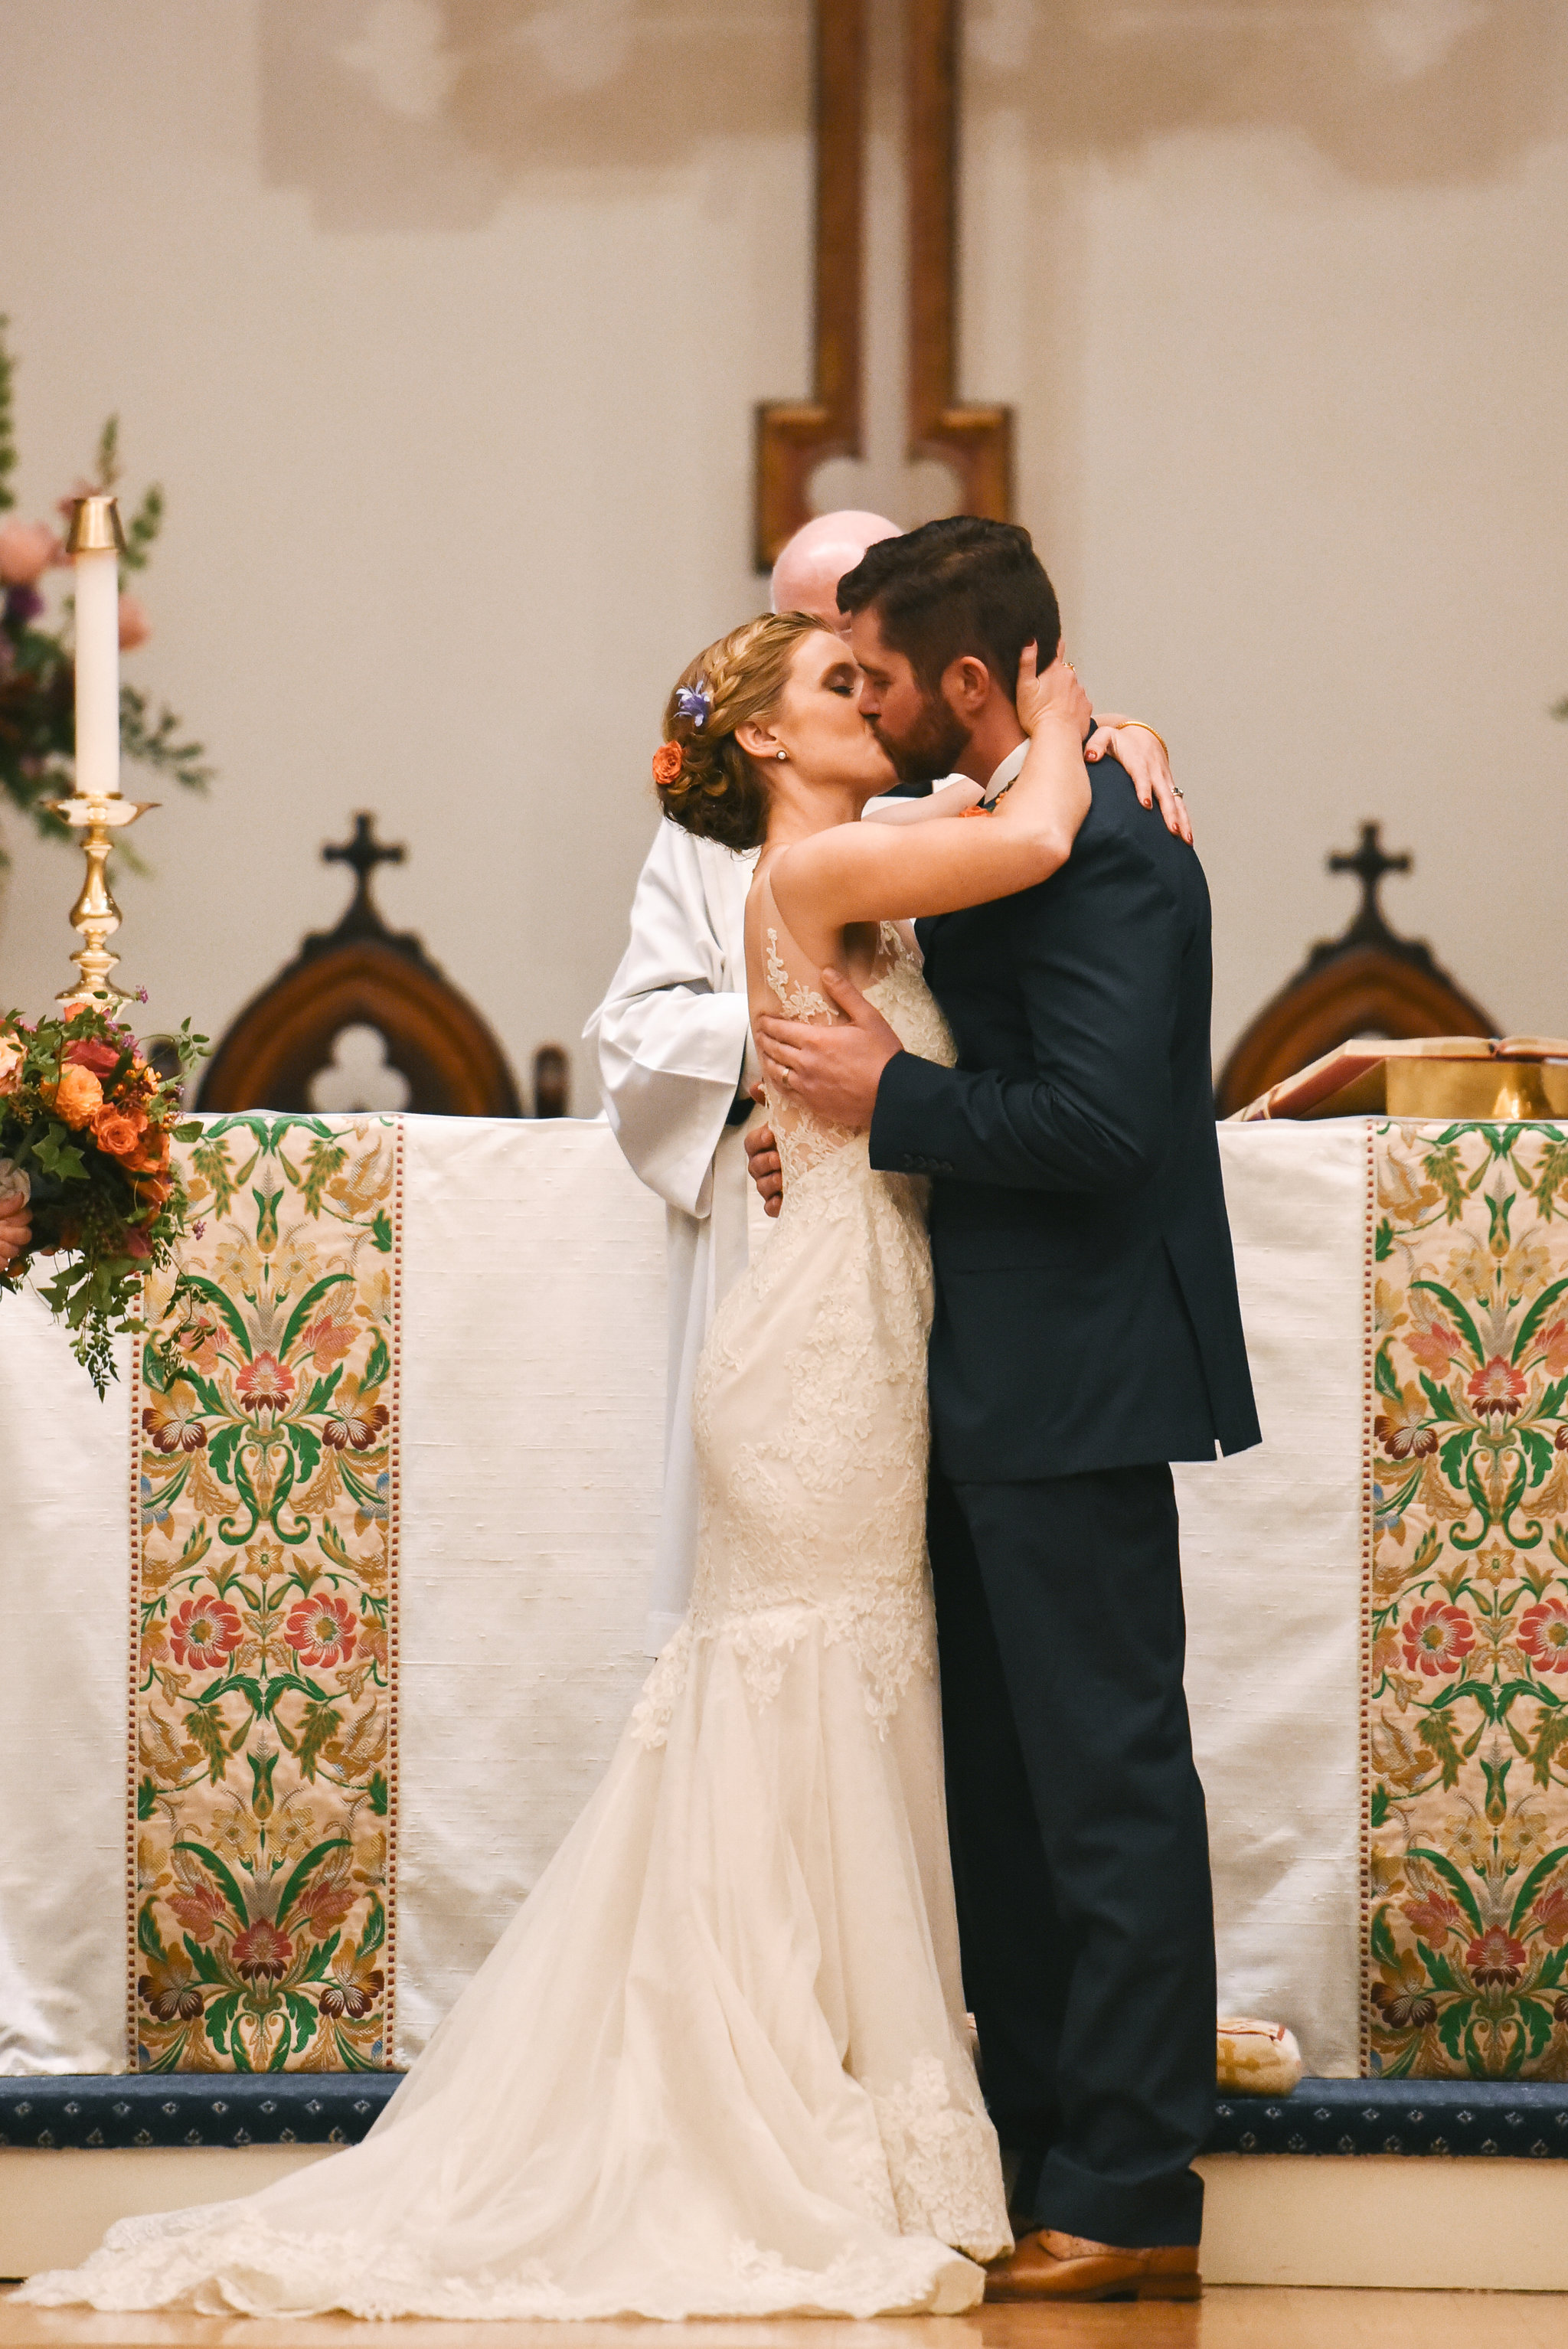 Alexandria, DC, Jos A. Bank Suit, Lian Carlo Wedding Dress, St. Paul's Episcopal Church, Church Wedding, Ceremony, First Kiss, Bride and Groom, Wedding Kiss, Baltimore Wedding Photographer